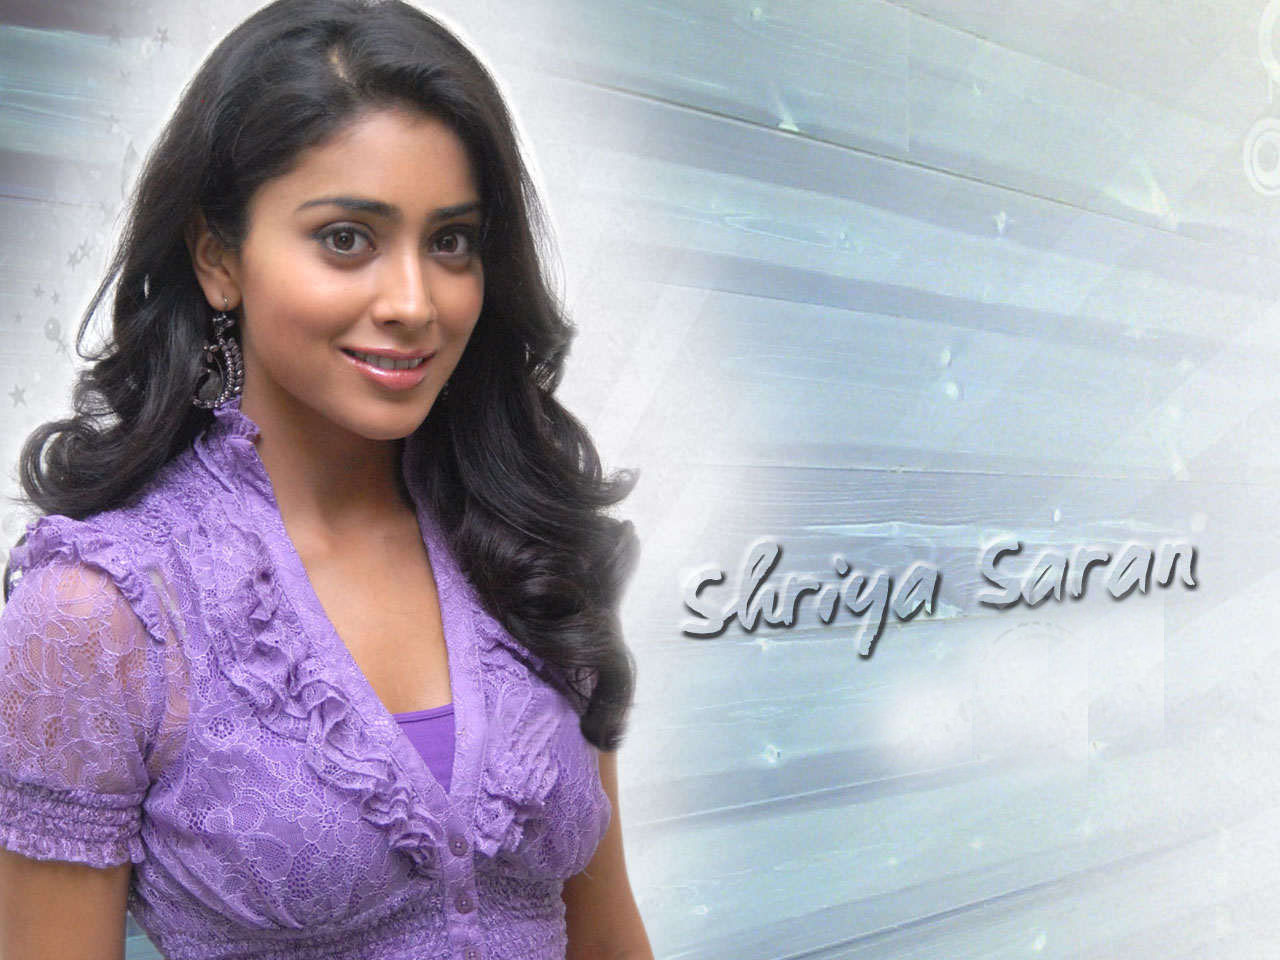 Shriya Saran High Resolution Images: Hollywood Celebrities: Shriya Saran Latest Photoshoot -8